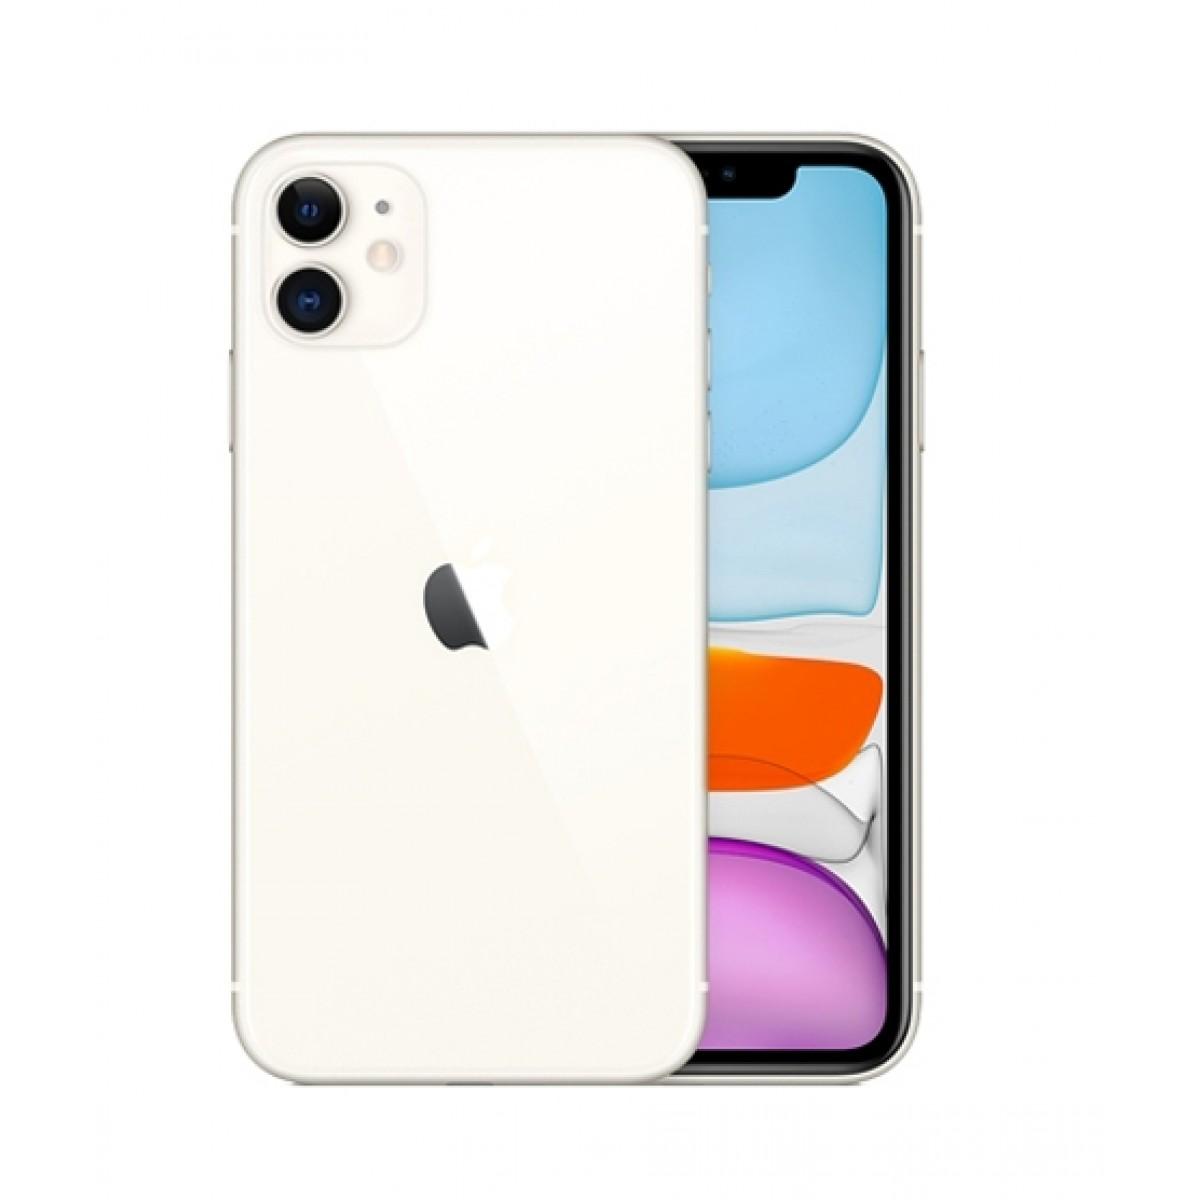 Apple iPhone 11 256GB Dual Sim White - Non PTA Compliant